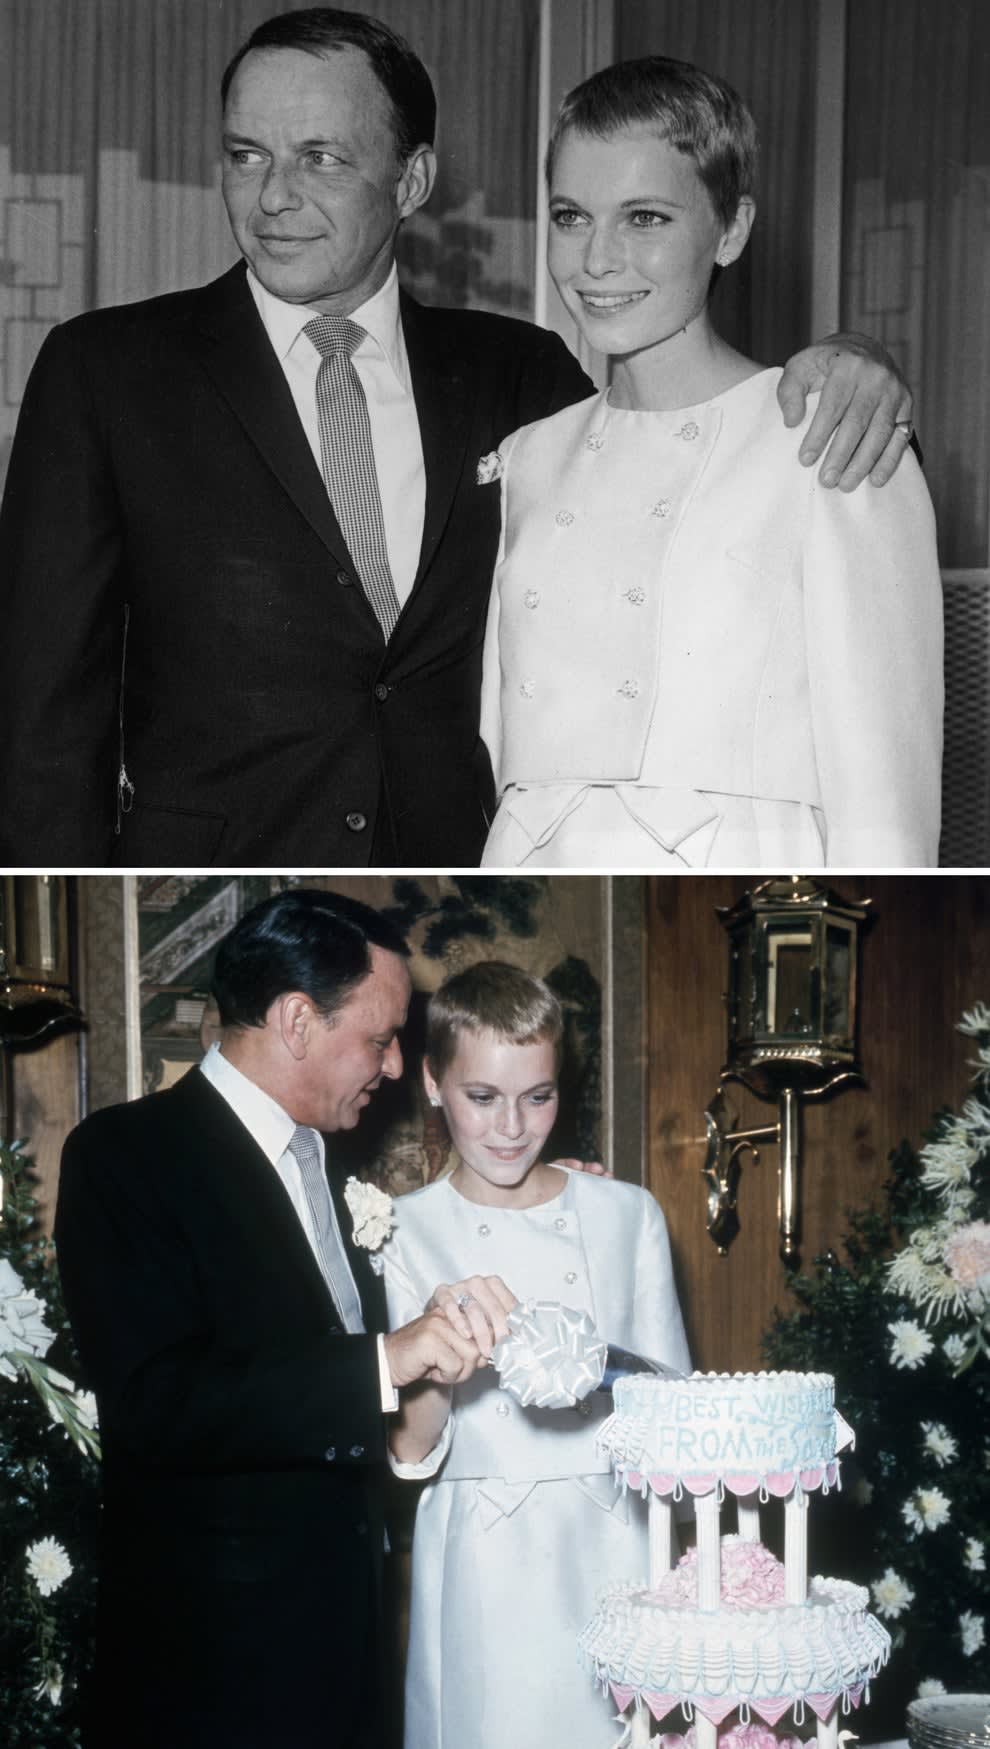 Farrow and Sinatra on their wedding day in 1966, cutting cake